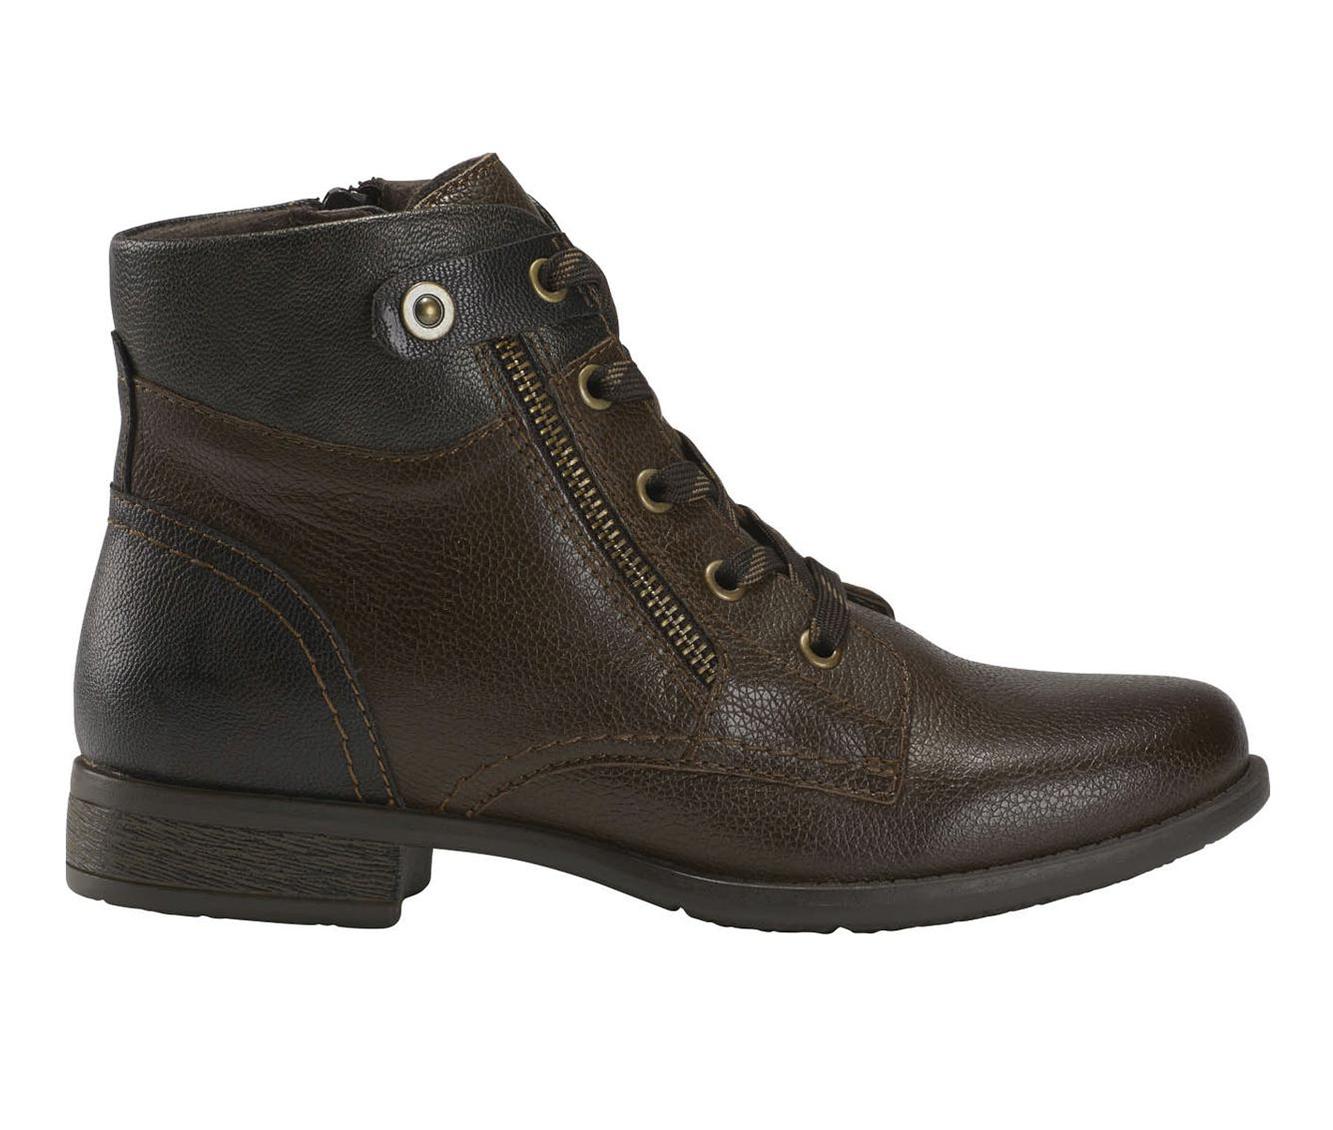 Earth Origins Navigate Nesta Women's Boots (Brown - Leather)